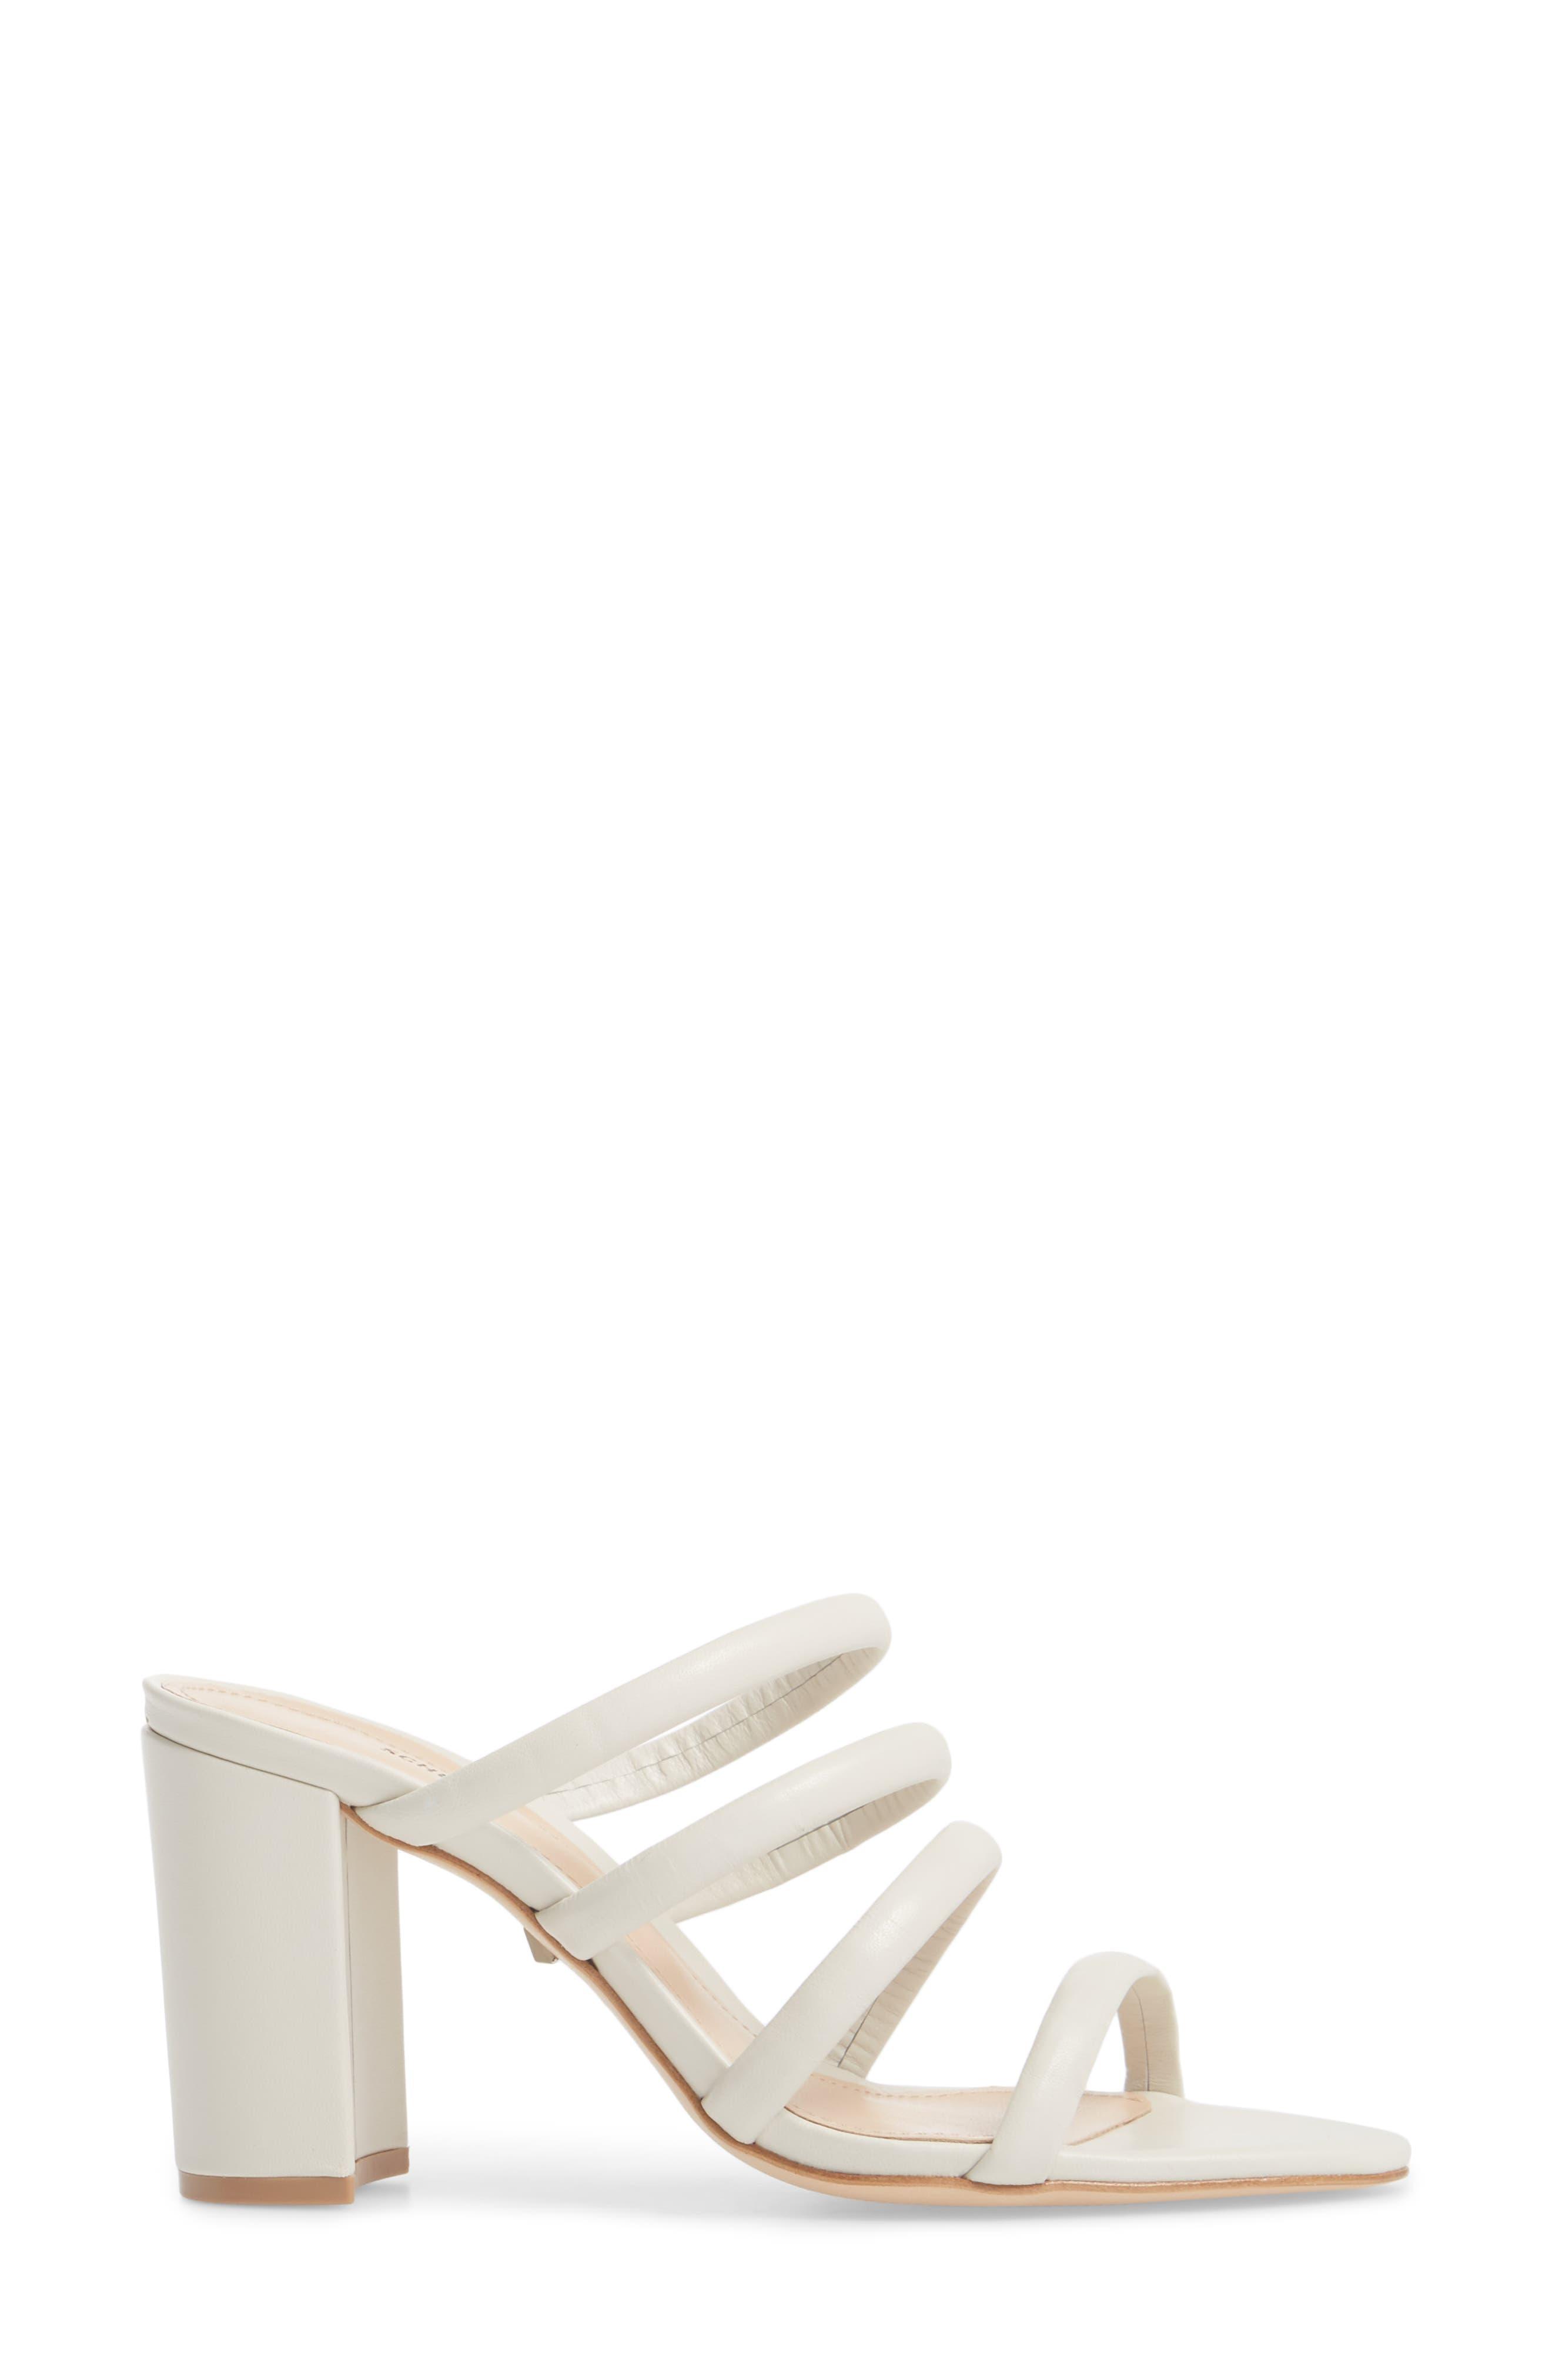 Felisa Block Heel Sandal,                             Alternate thumbnail 3, color,                             Pearl Leather